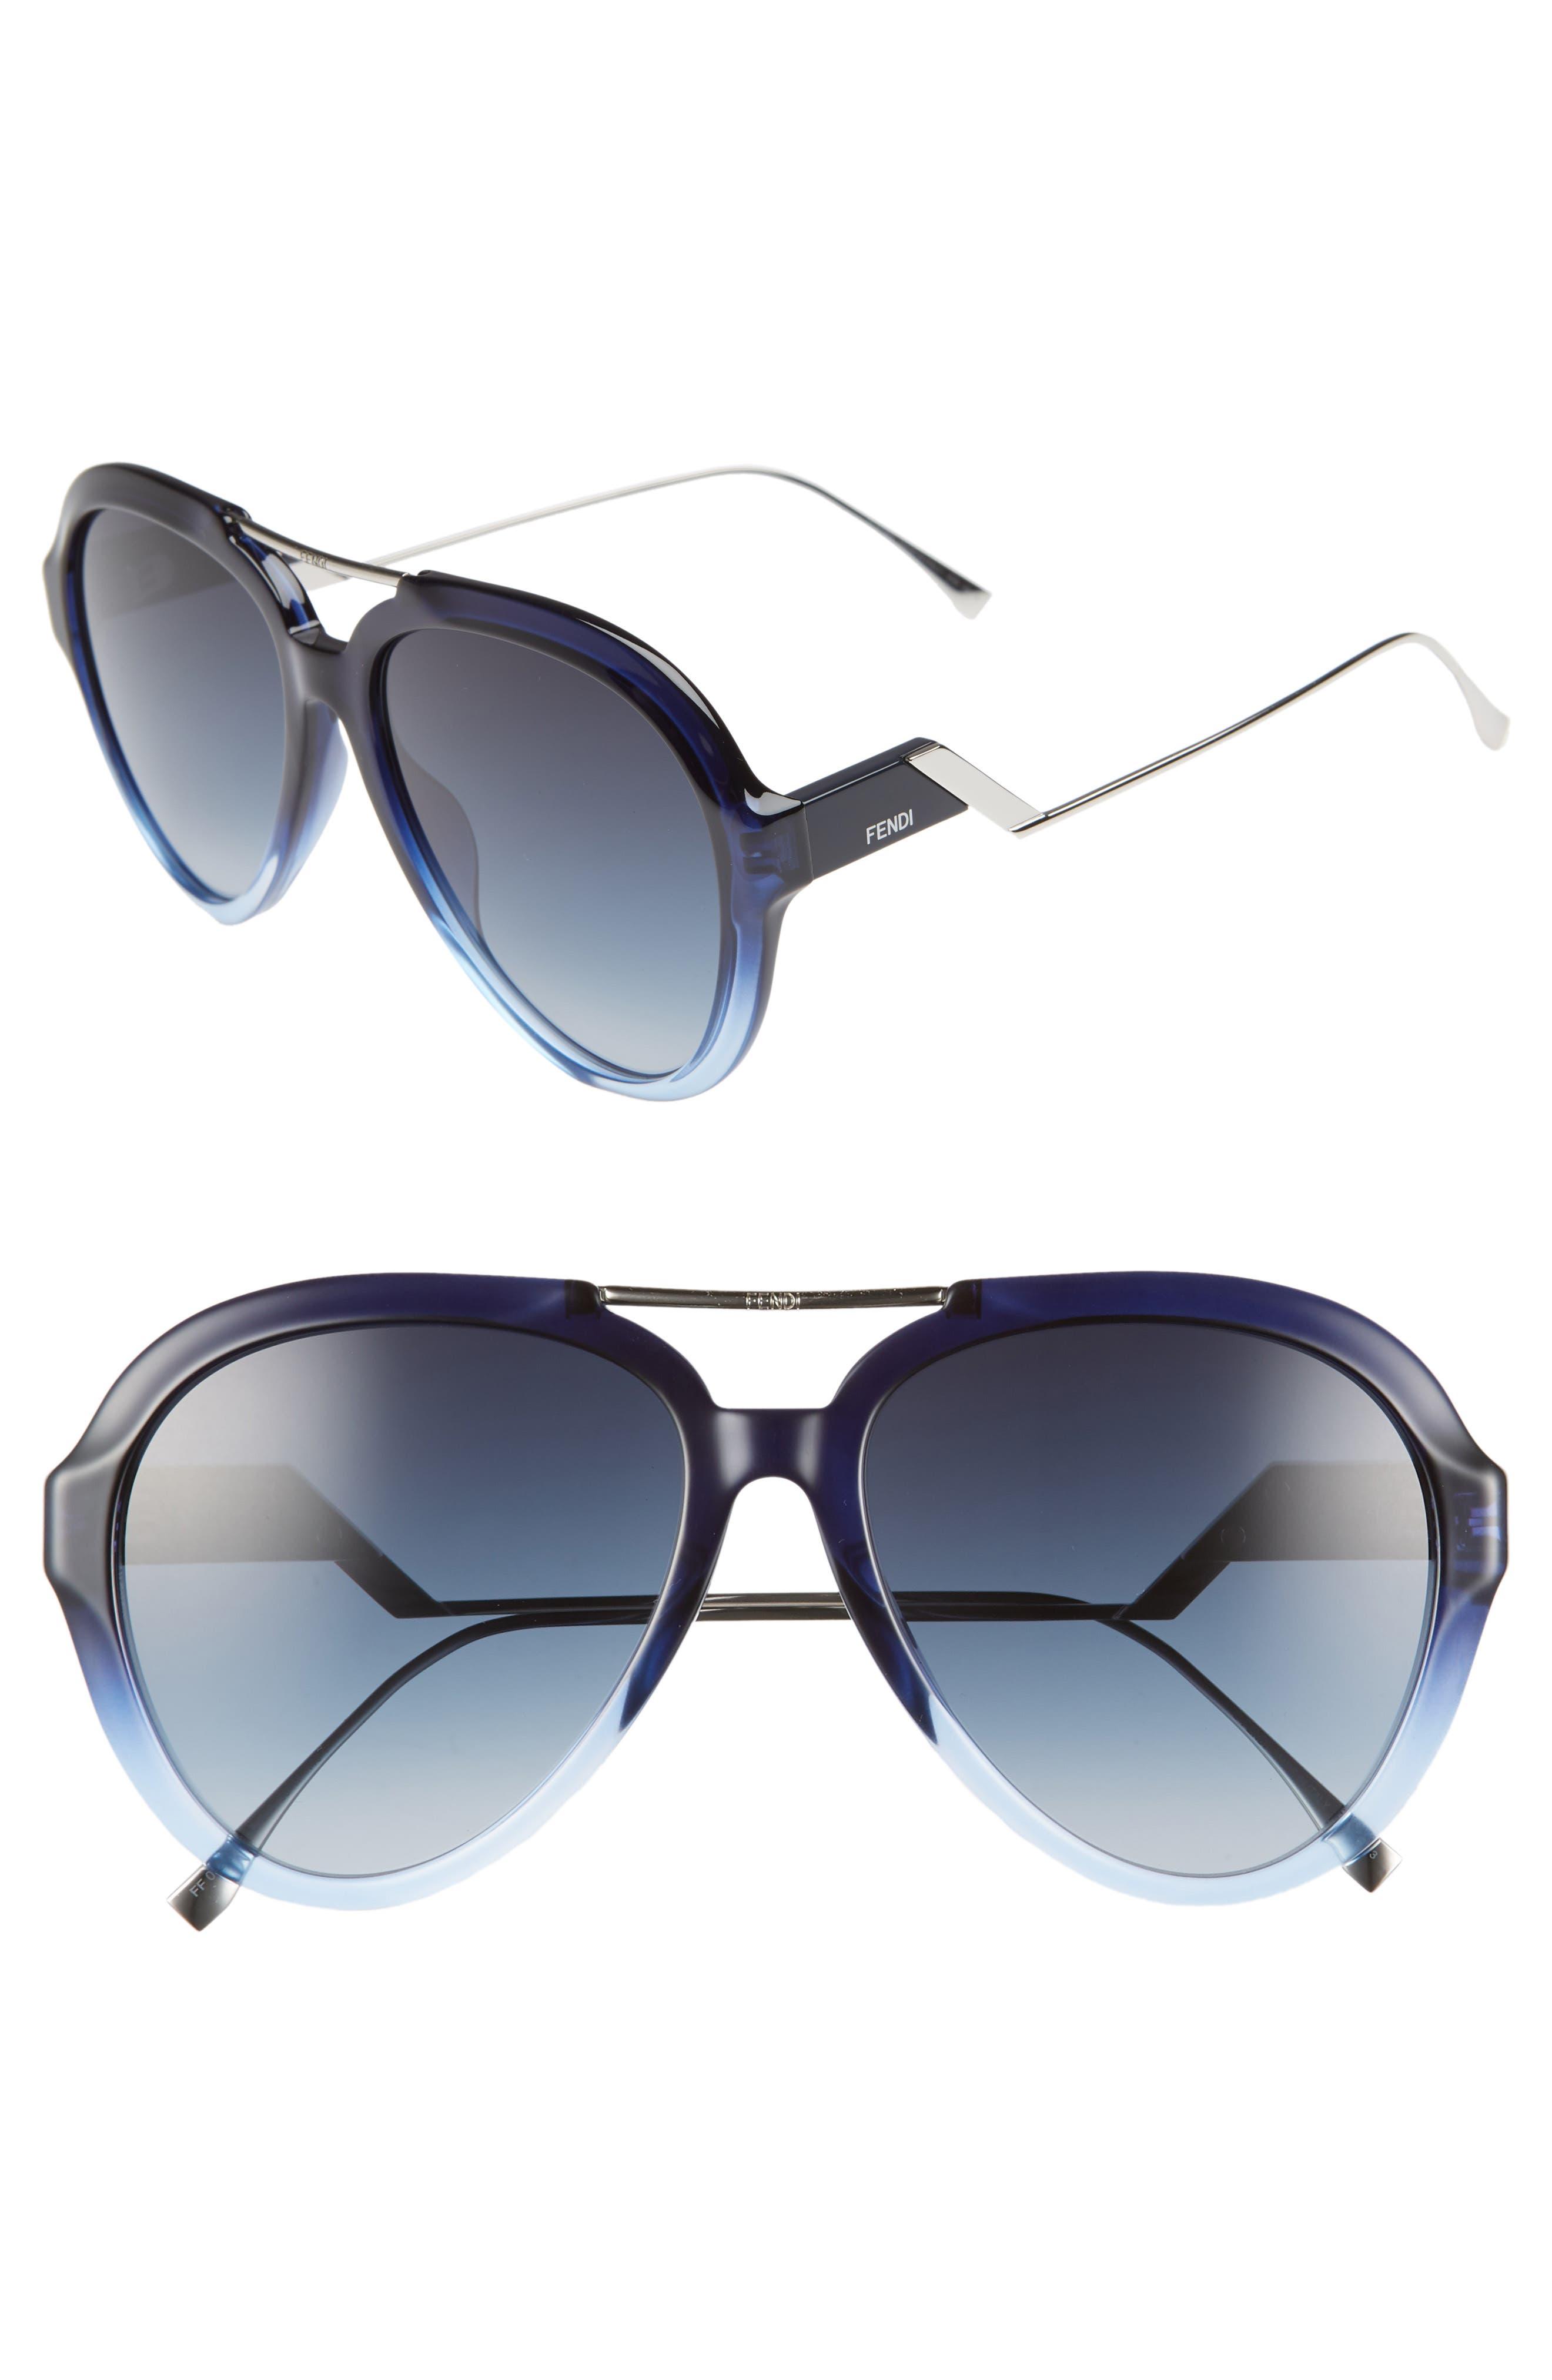 703e9c034022 Fendi Sunglasses for Women